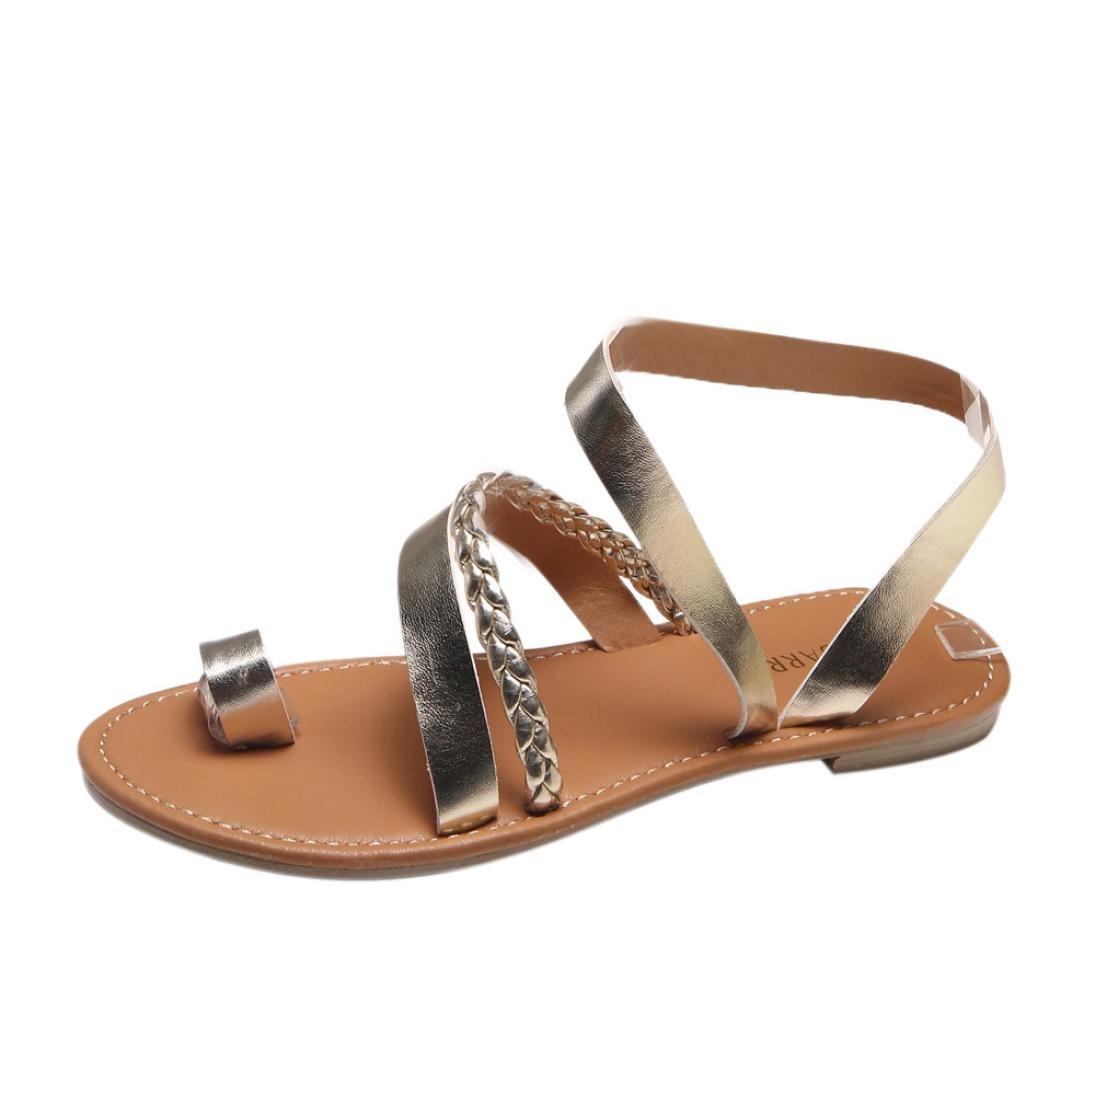 CLEARANCE SALE! MEIbax frauen im sommer strappy gladiator flat - flip - flops beach sandals schuhe (43, Gold)43|Gold